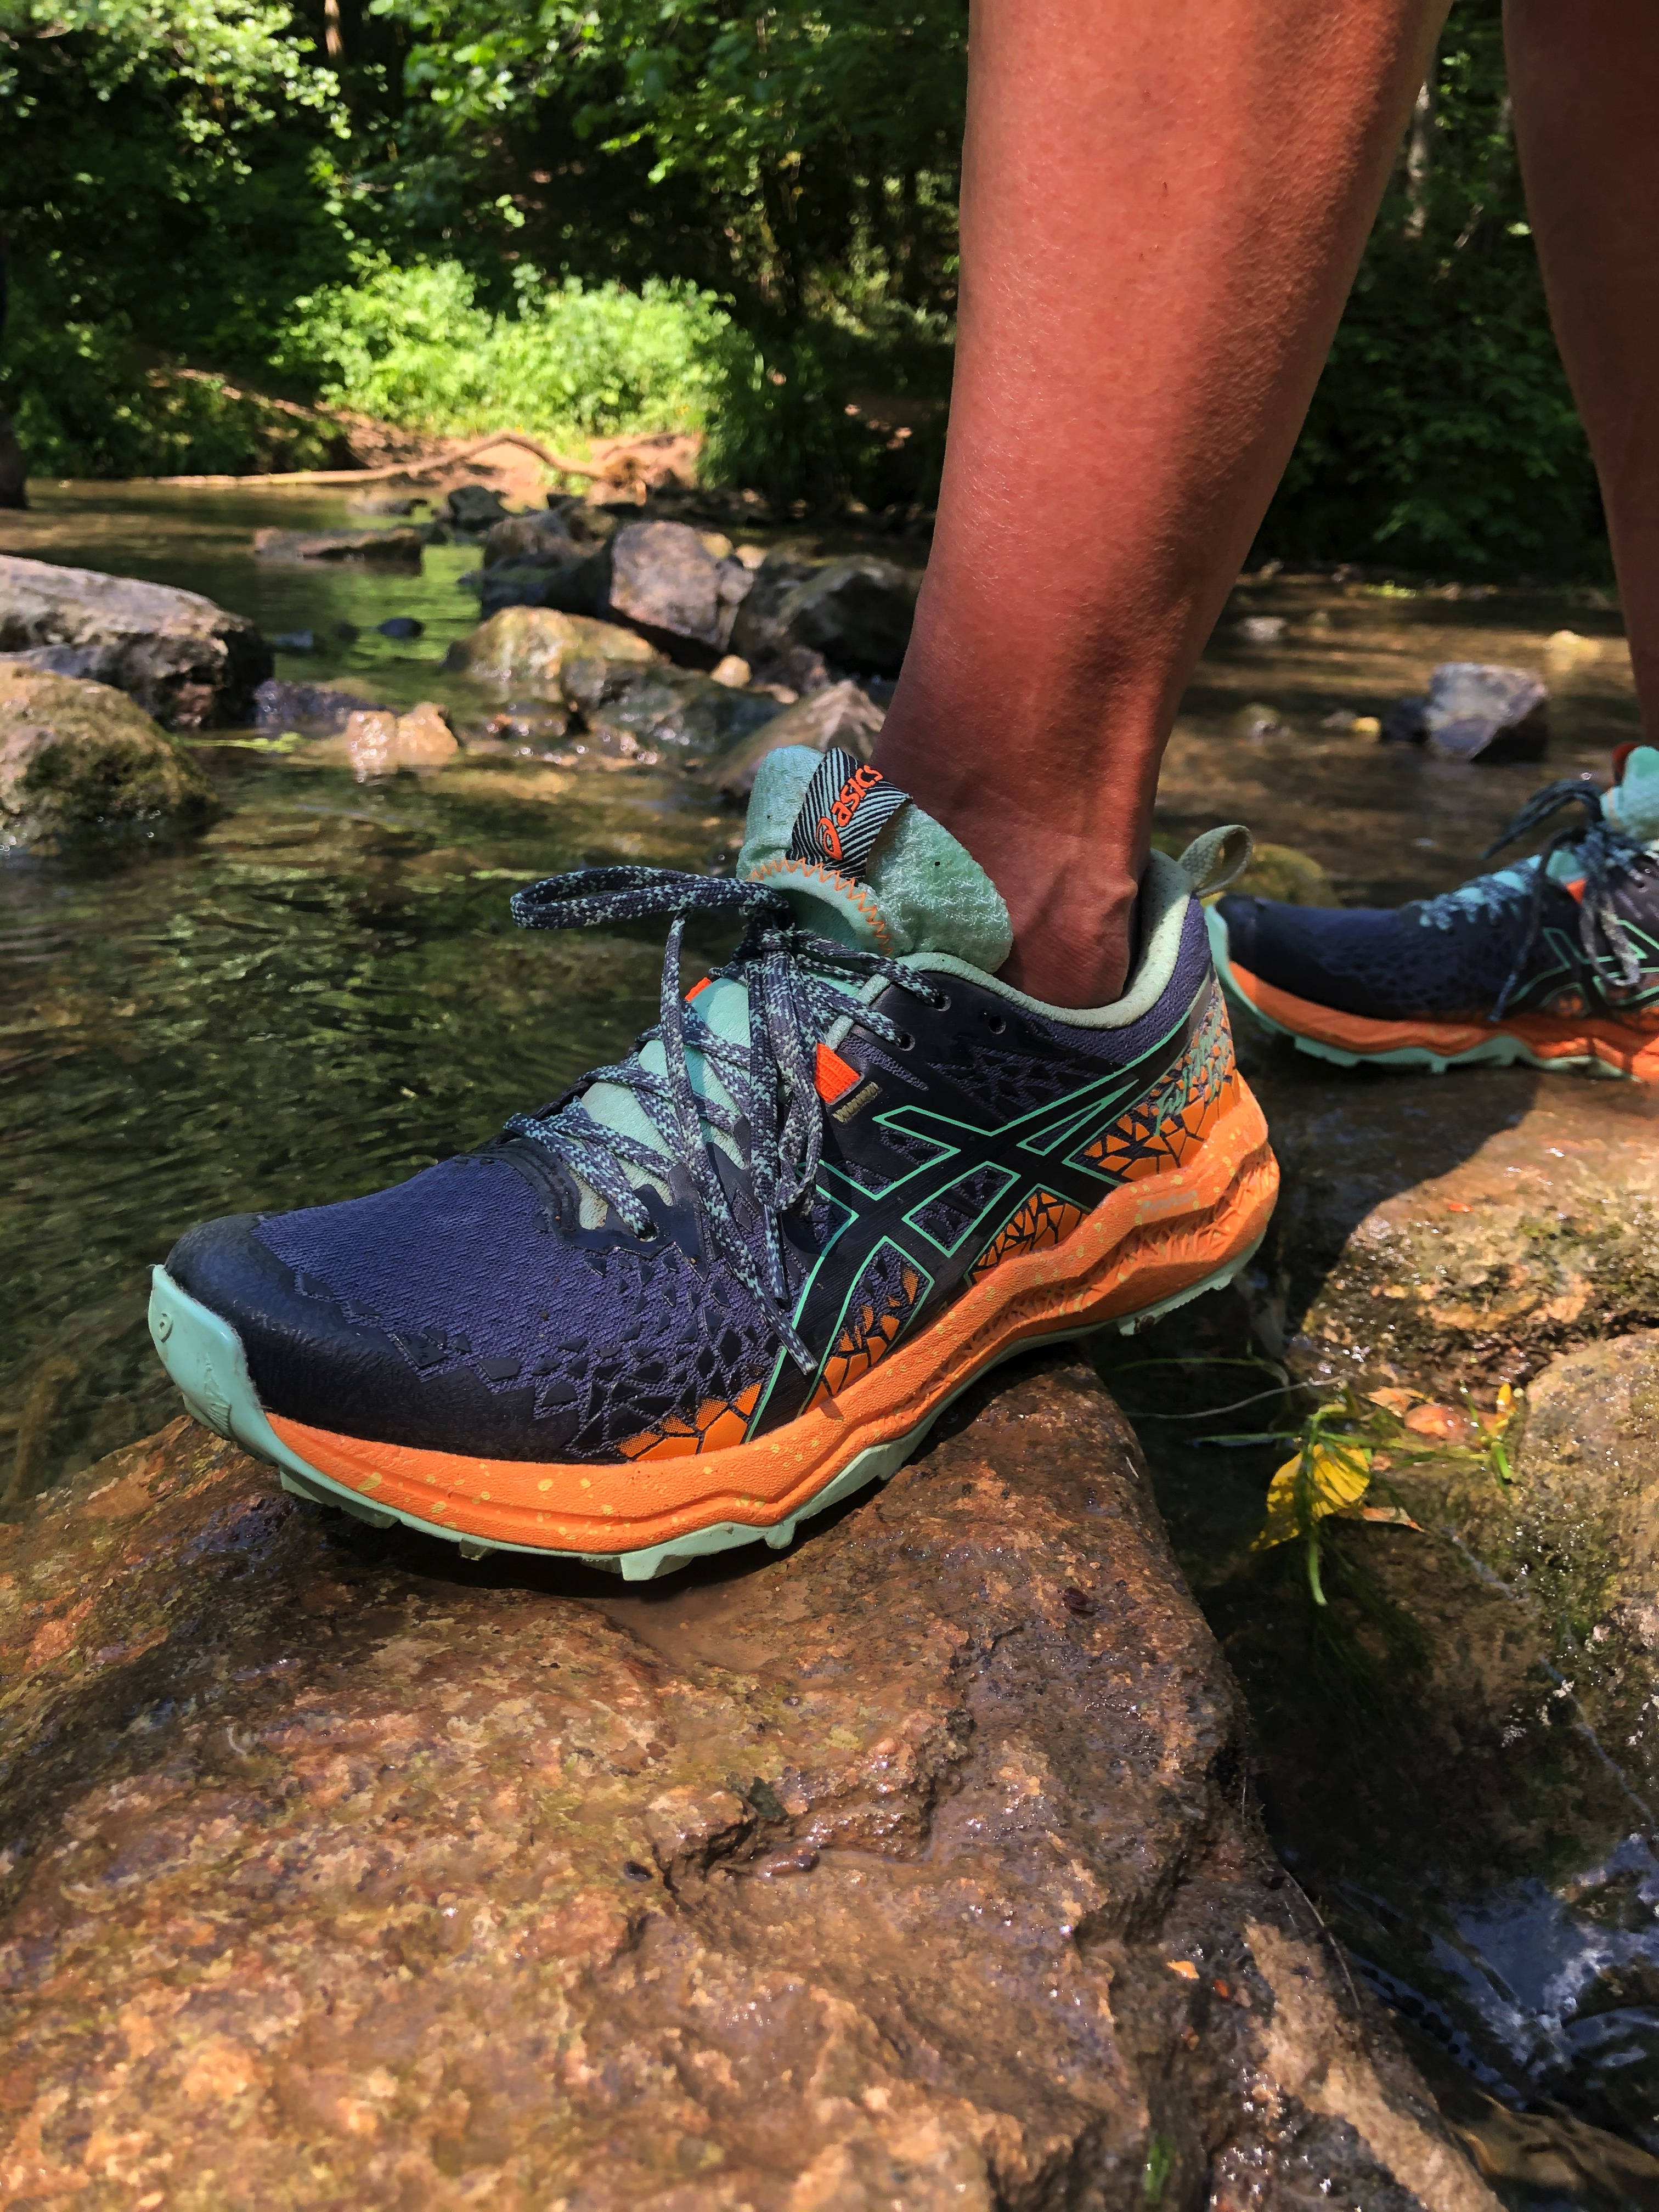 ASICS FrontRunner - Fuji Trabuco Lyte Shoe Review